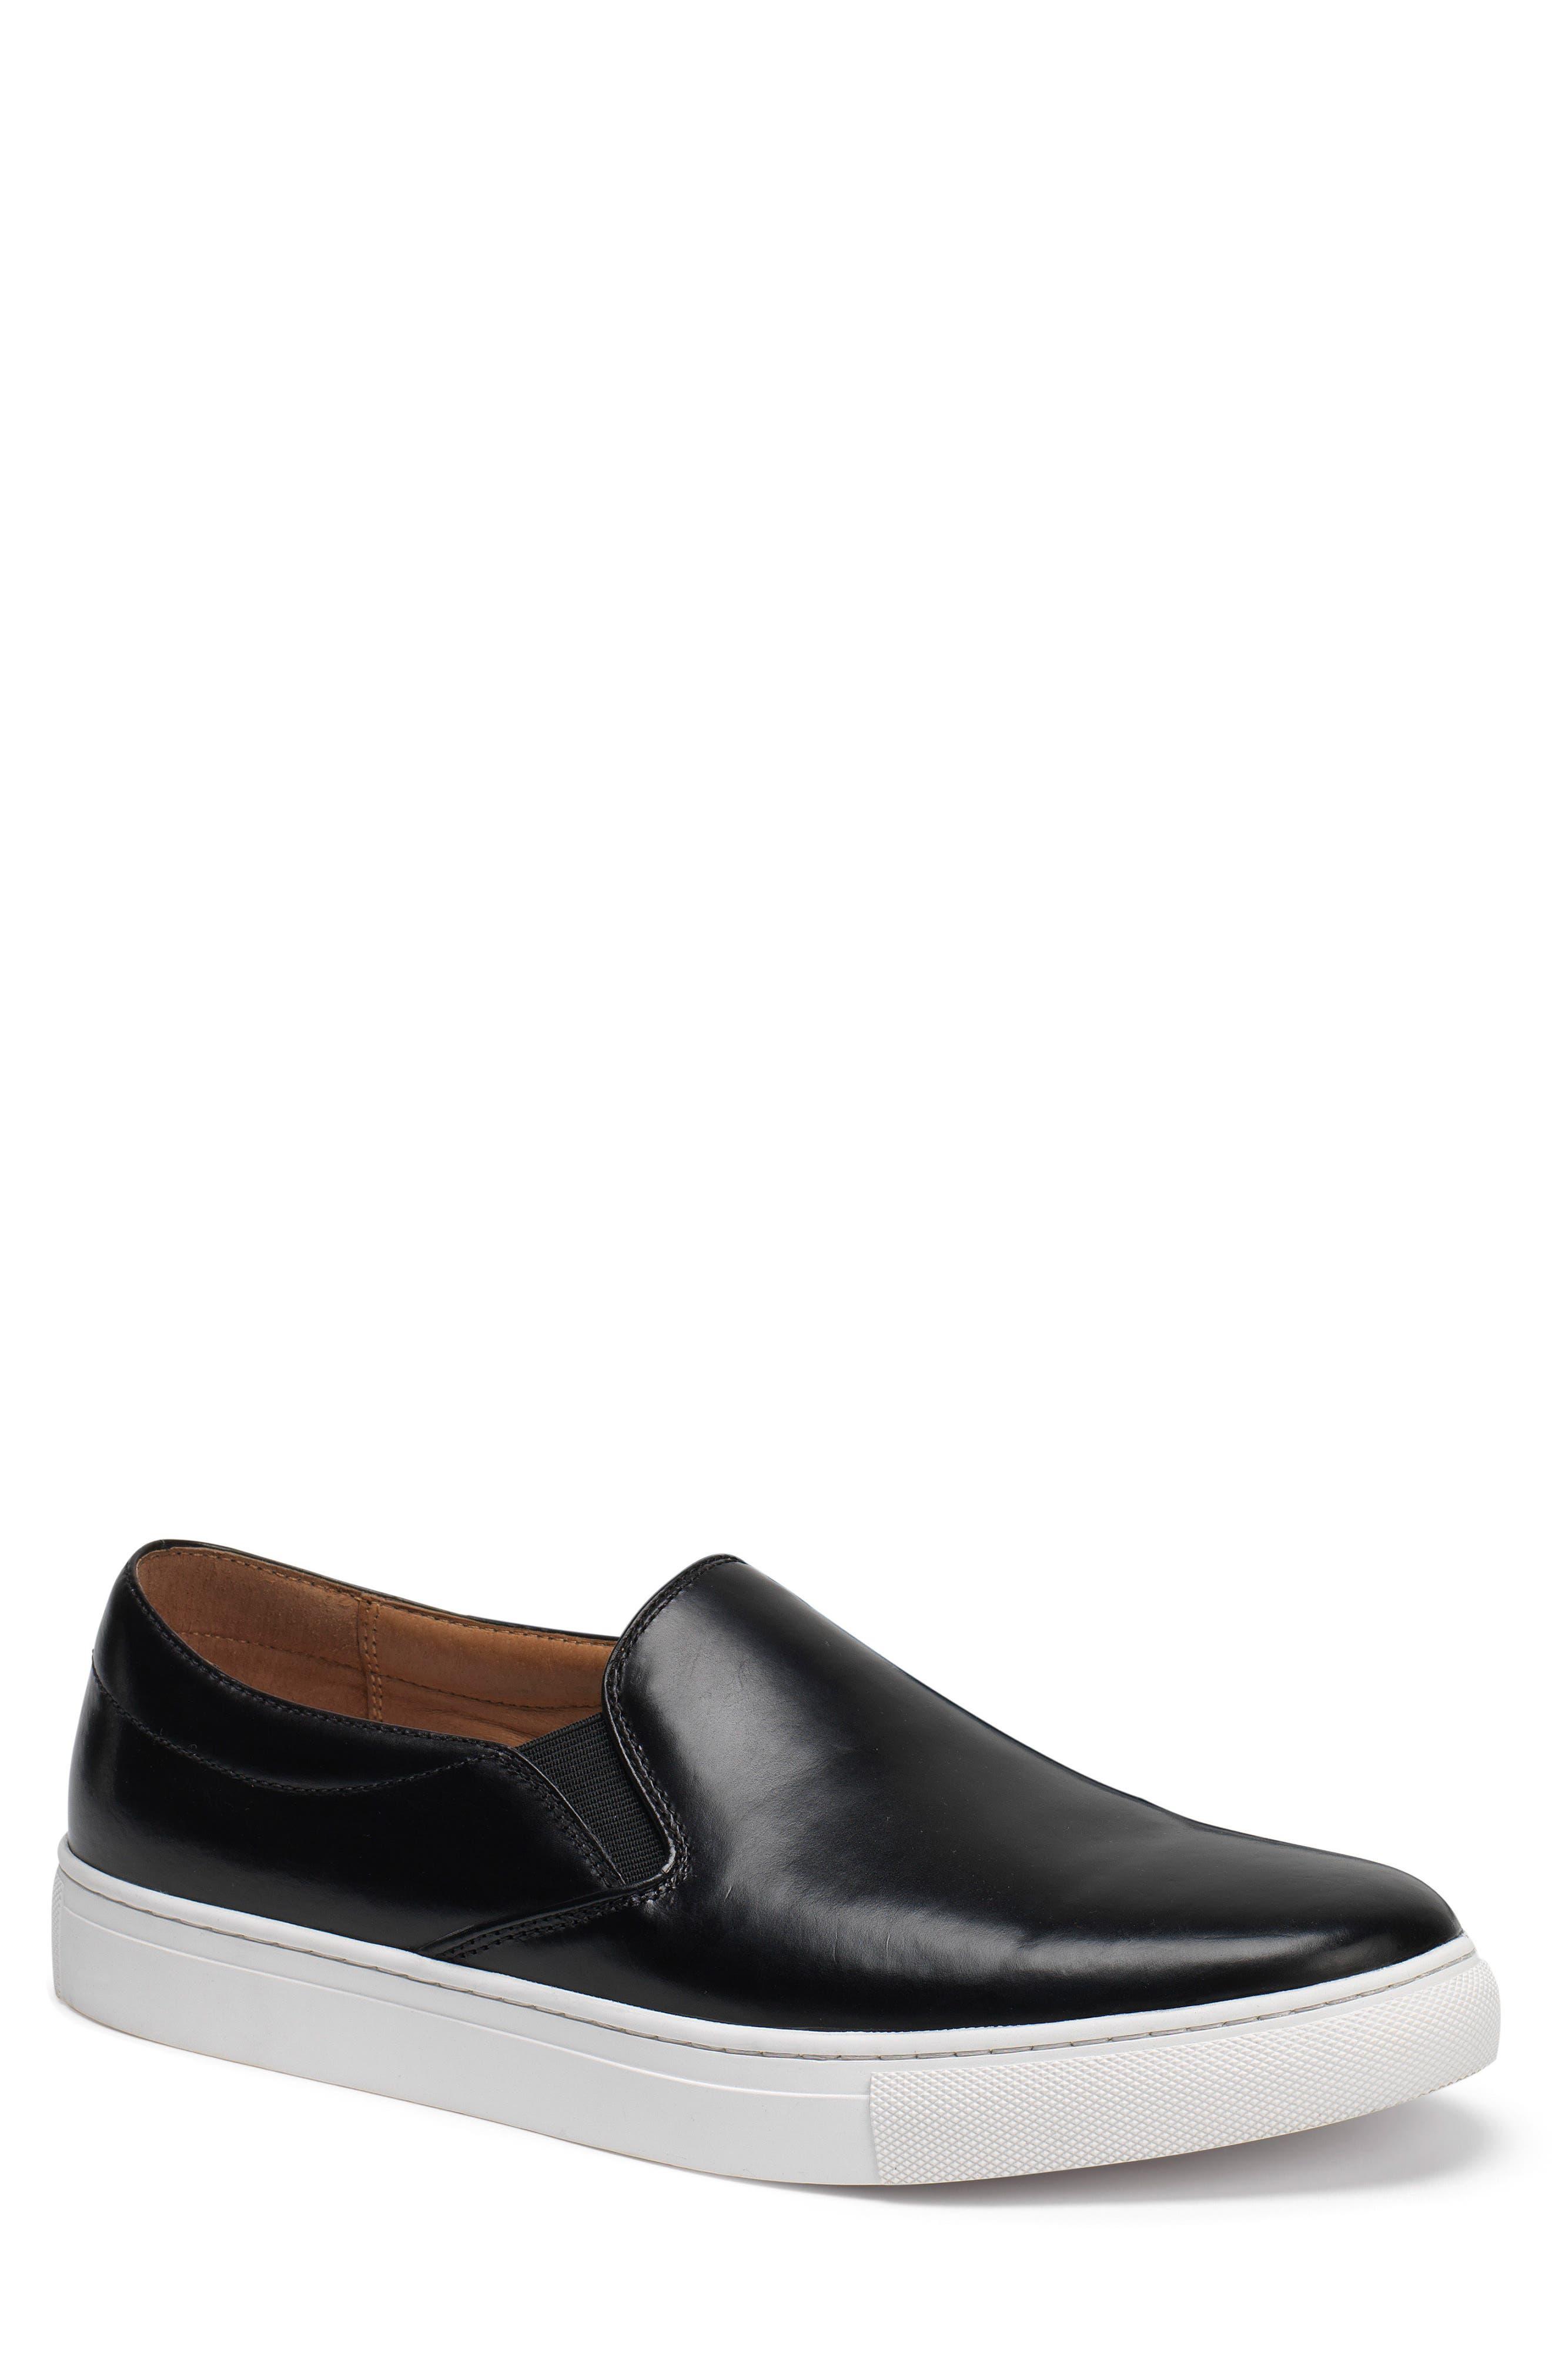 Alex Slip-On Sneaker,                         Main,                         color, Black Leather